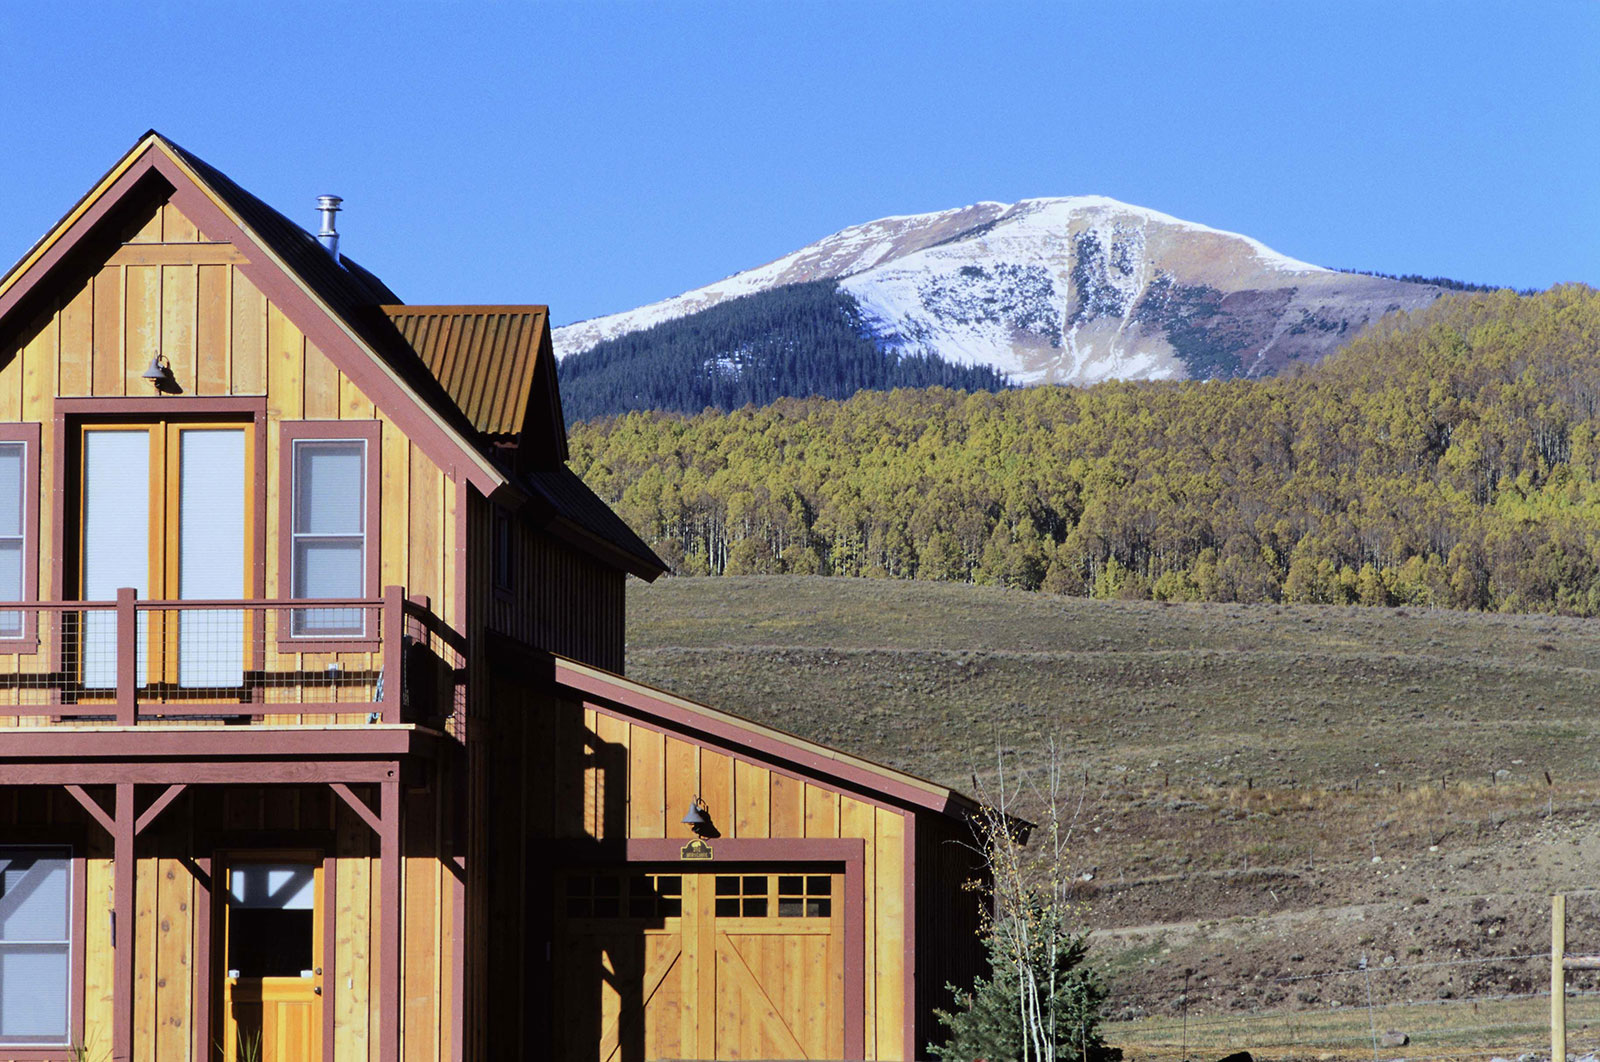 Pitchfork Neighborhood Crested Butte Colorado